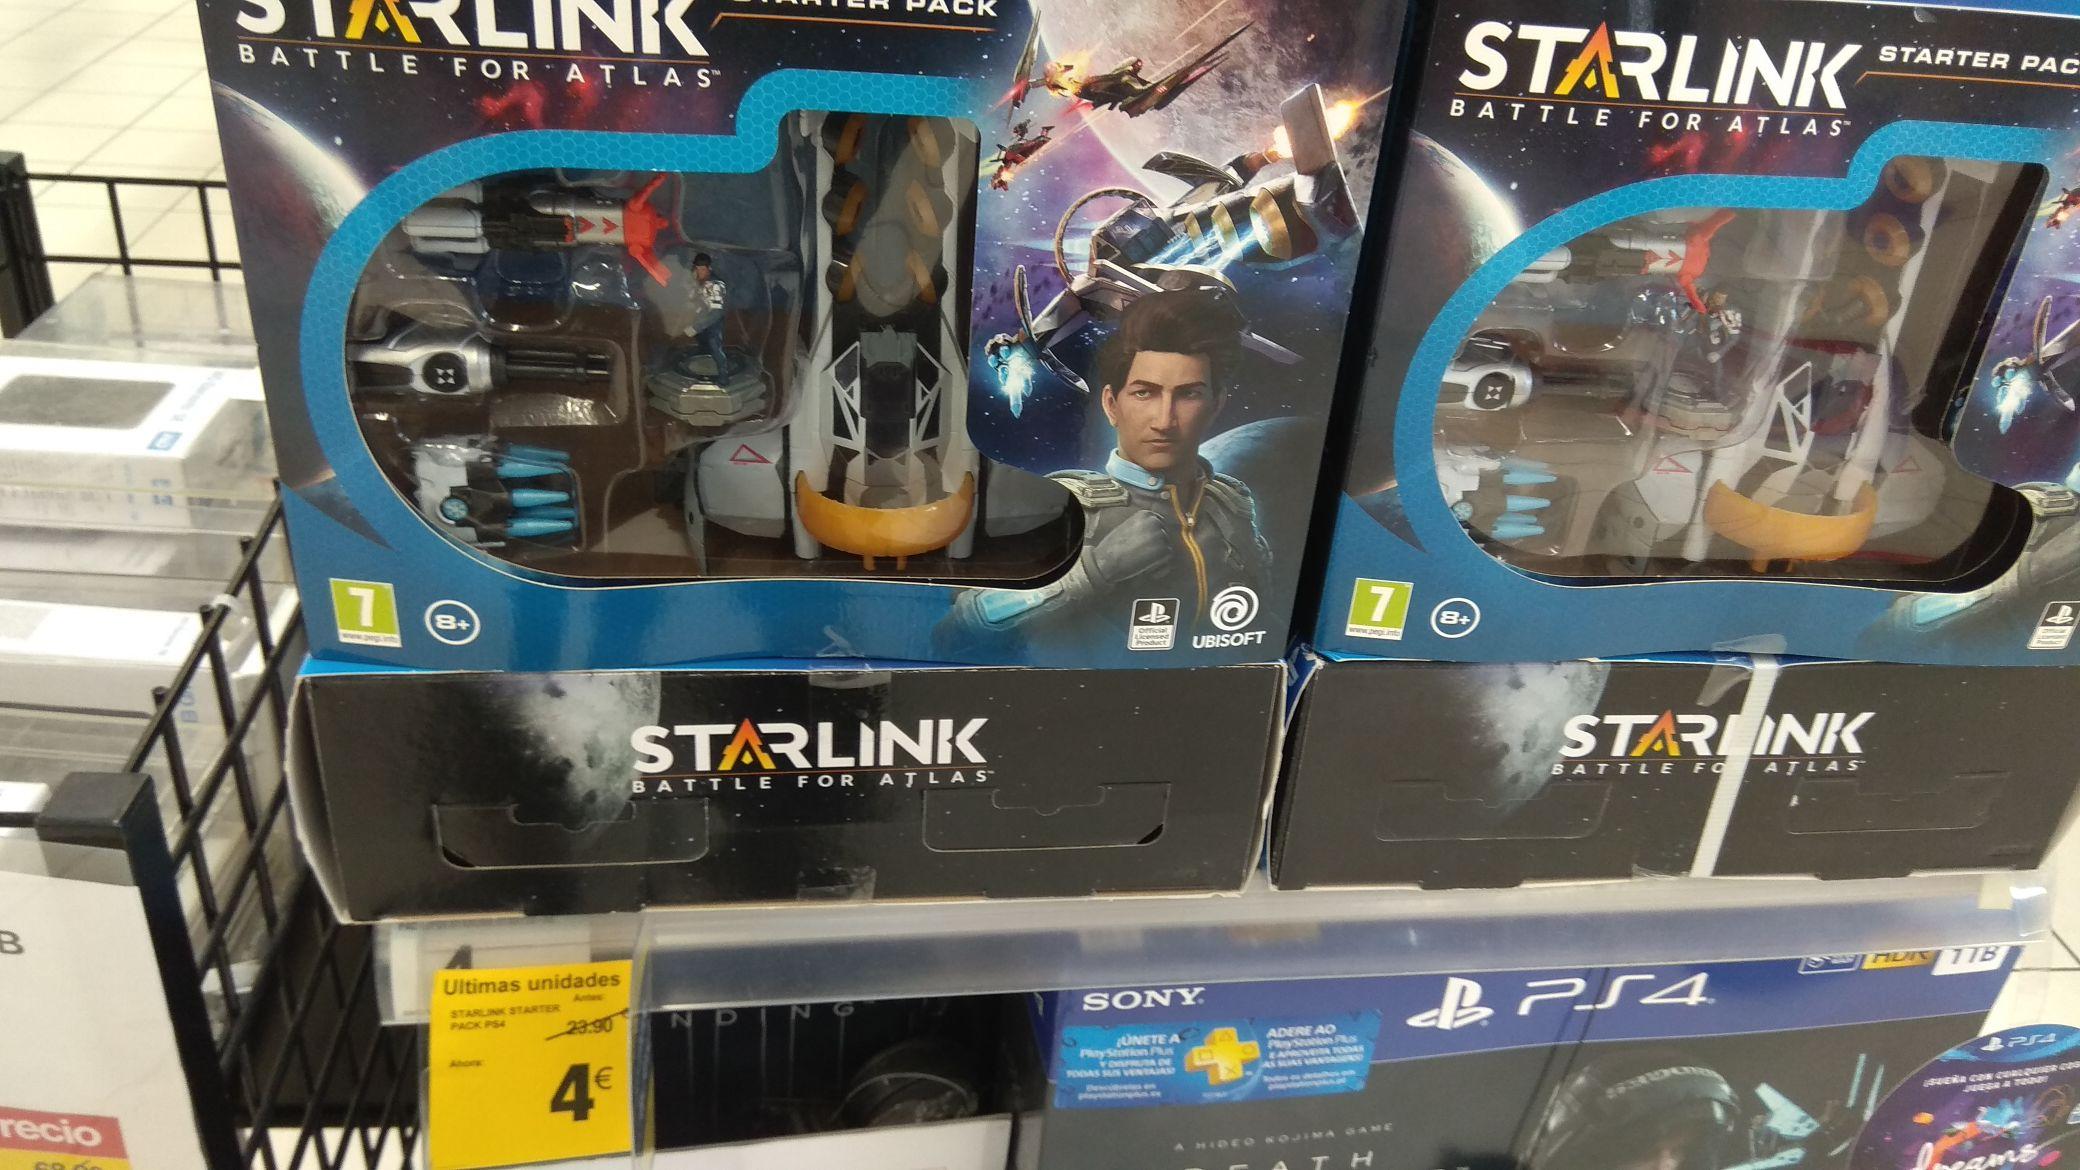 Starlink Battle for Atlas (Carrefour)(Vinaròs)